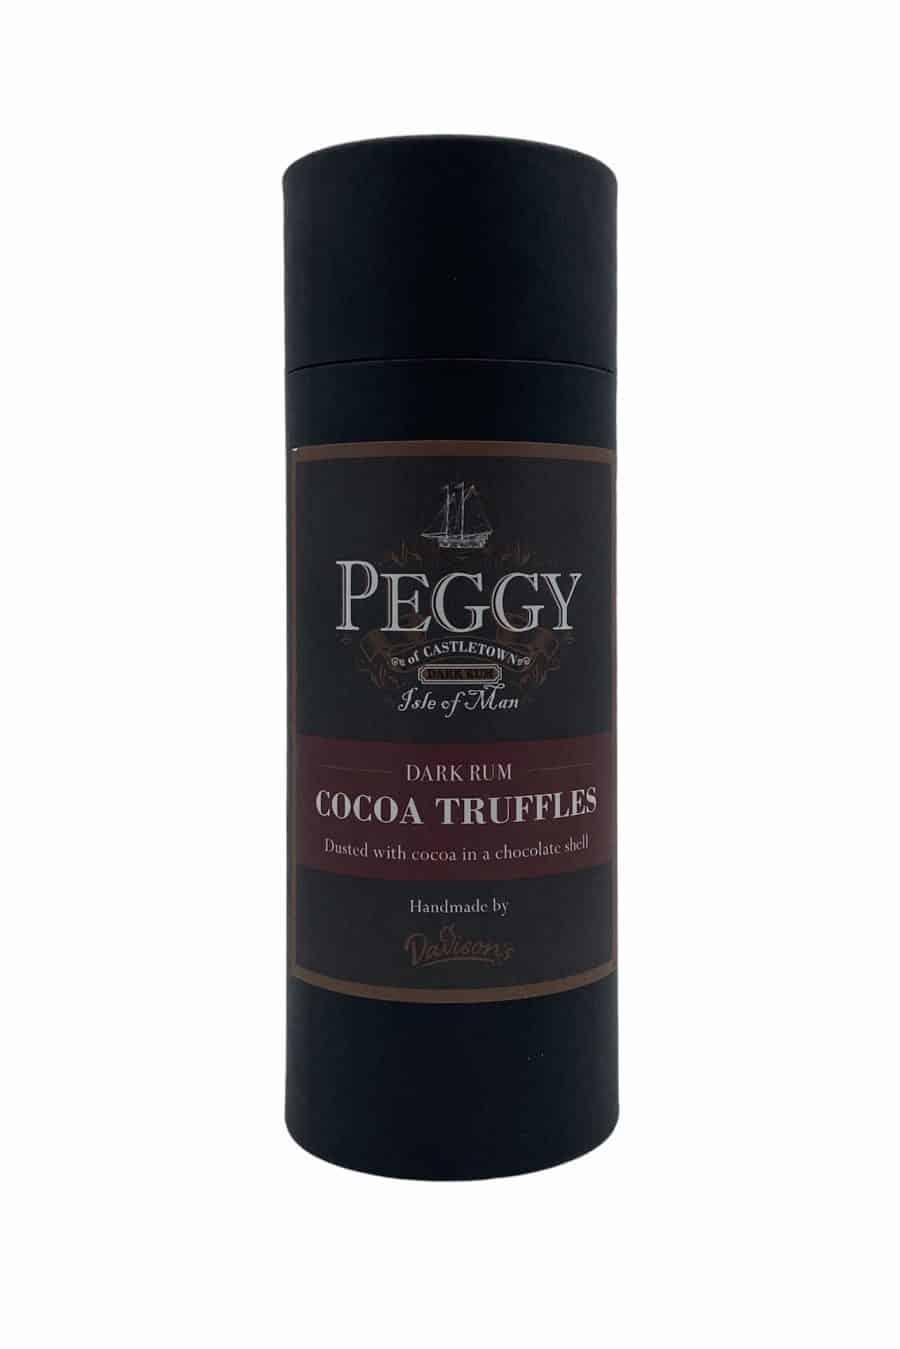 Peggy Rum - Cocoa Truffles